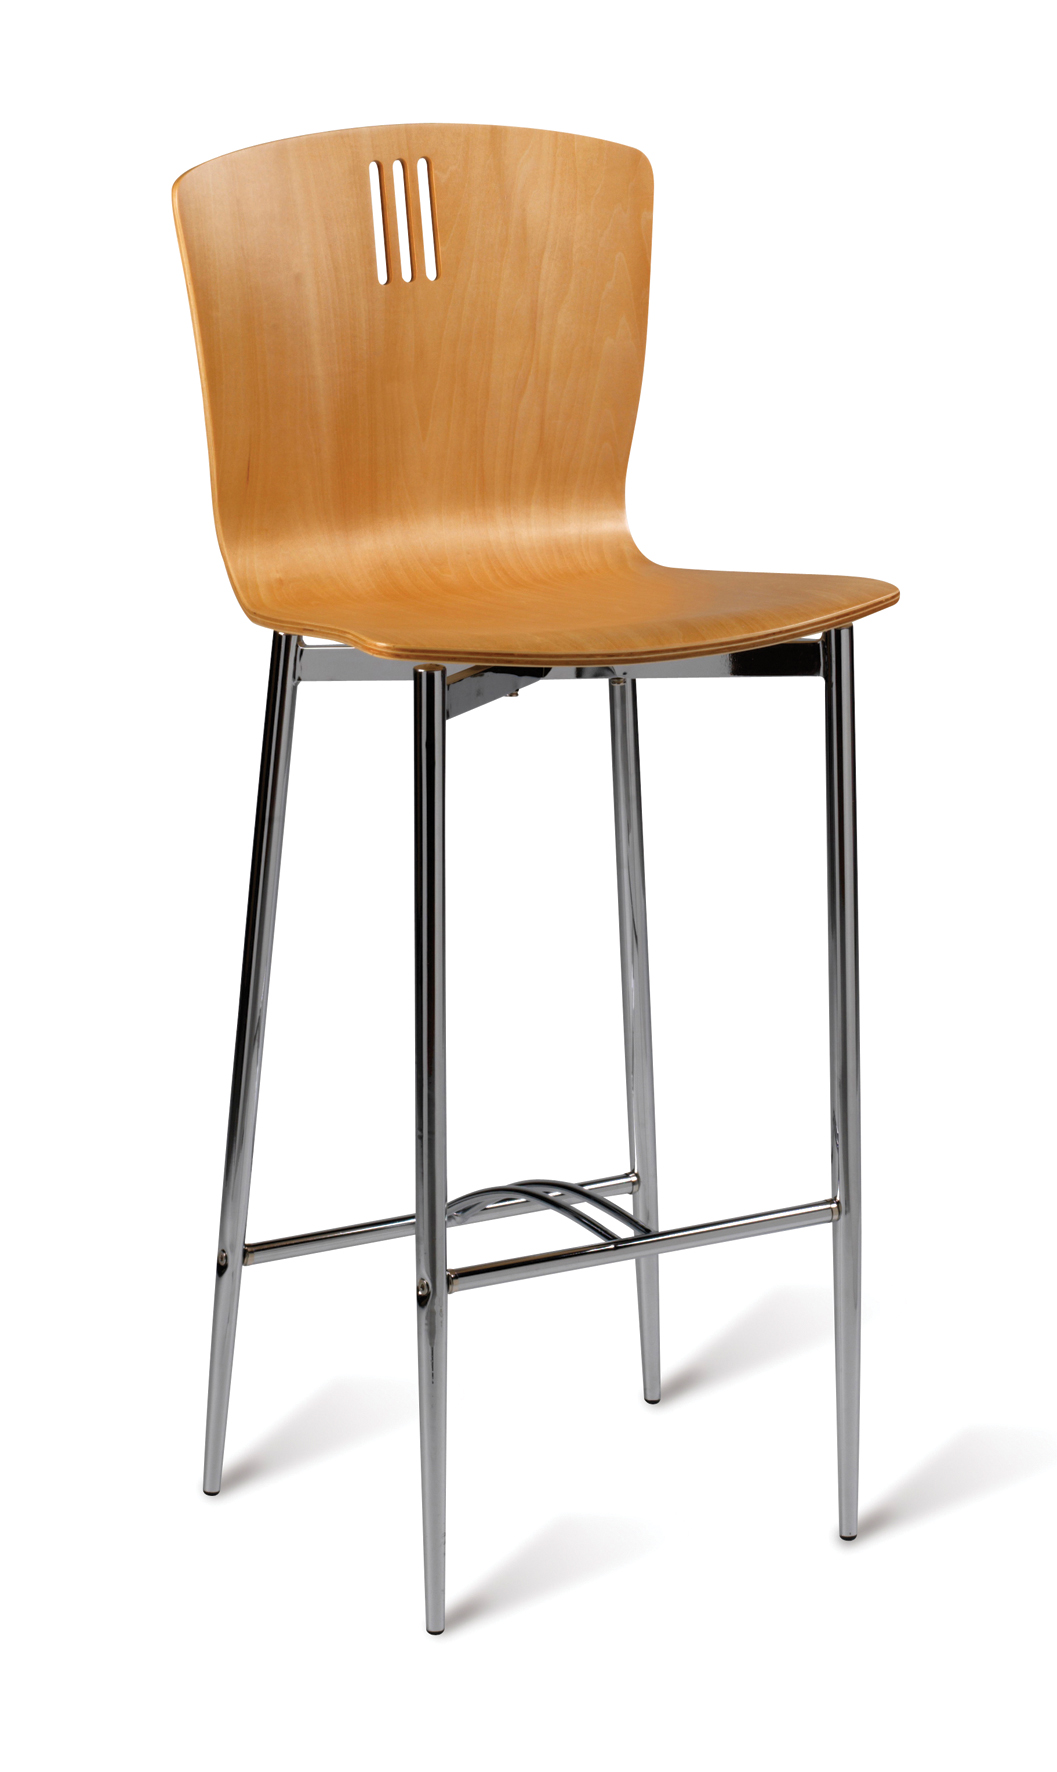 contemporary cafe furniture. Pelle Cafe Bar Stool Contemporary Furniture